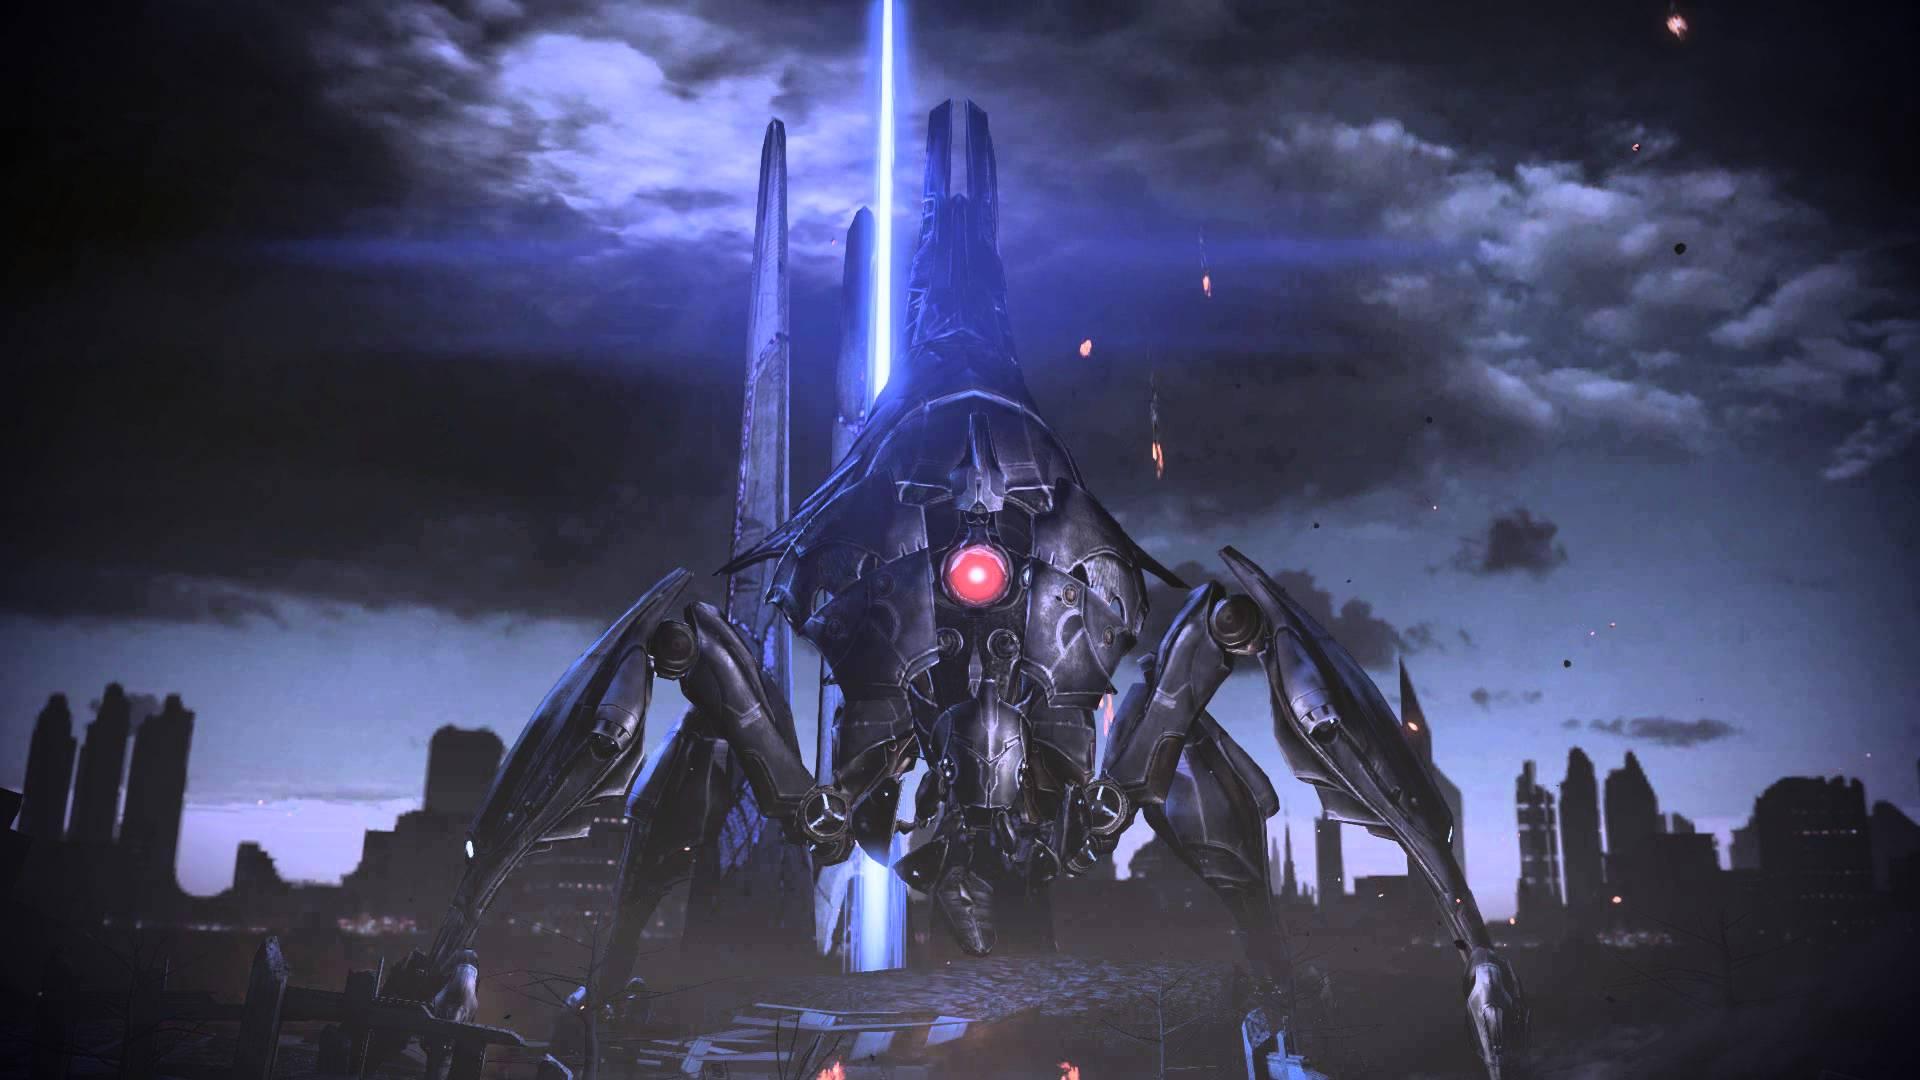 Mass Effect 3 Reaper Destroyer Dreamscene Video Wallpaper - YouTube